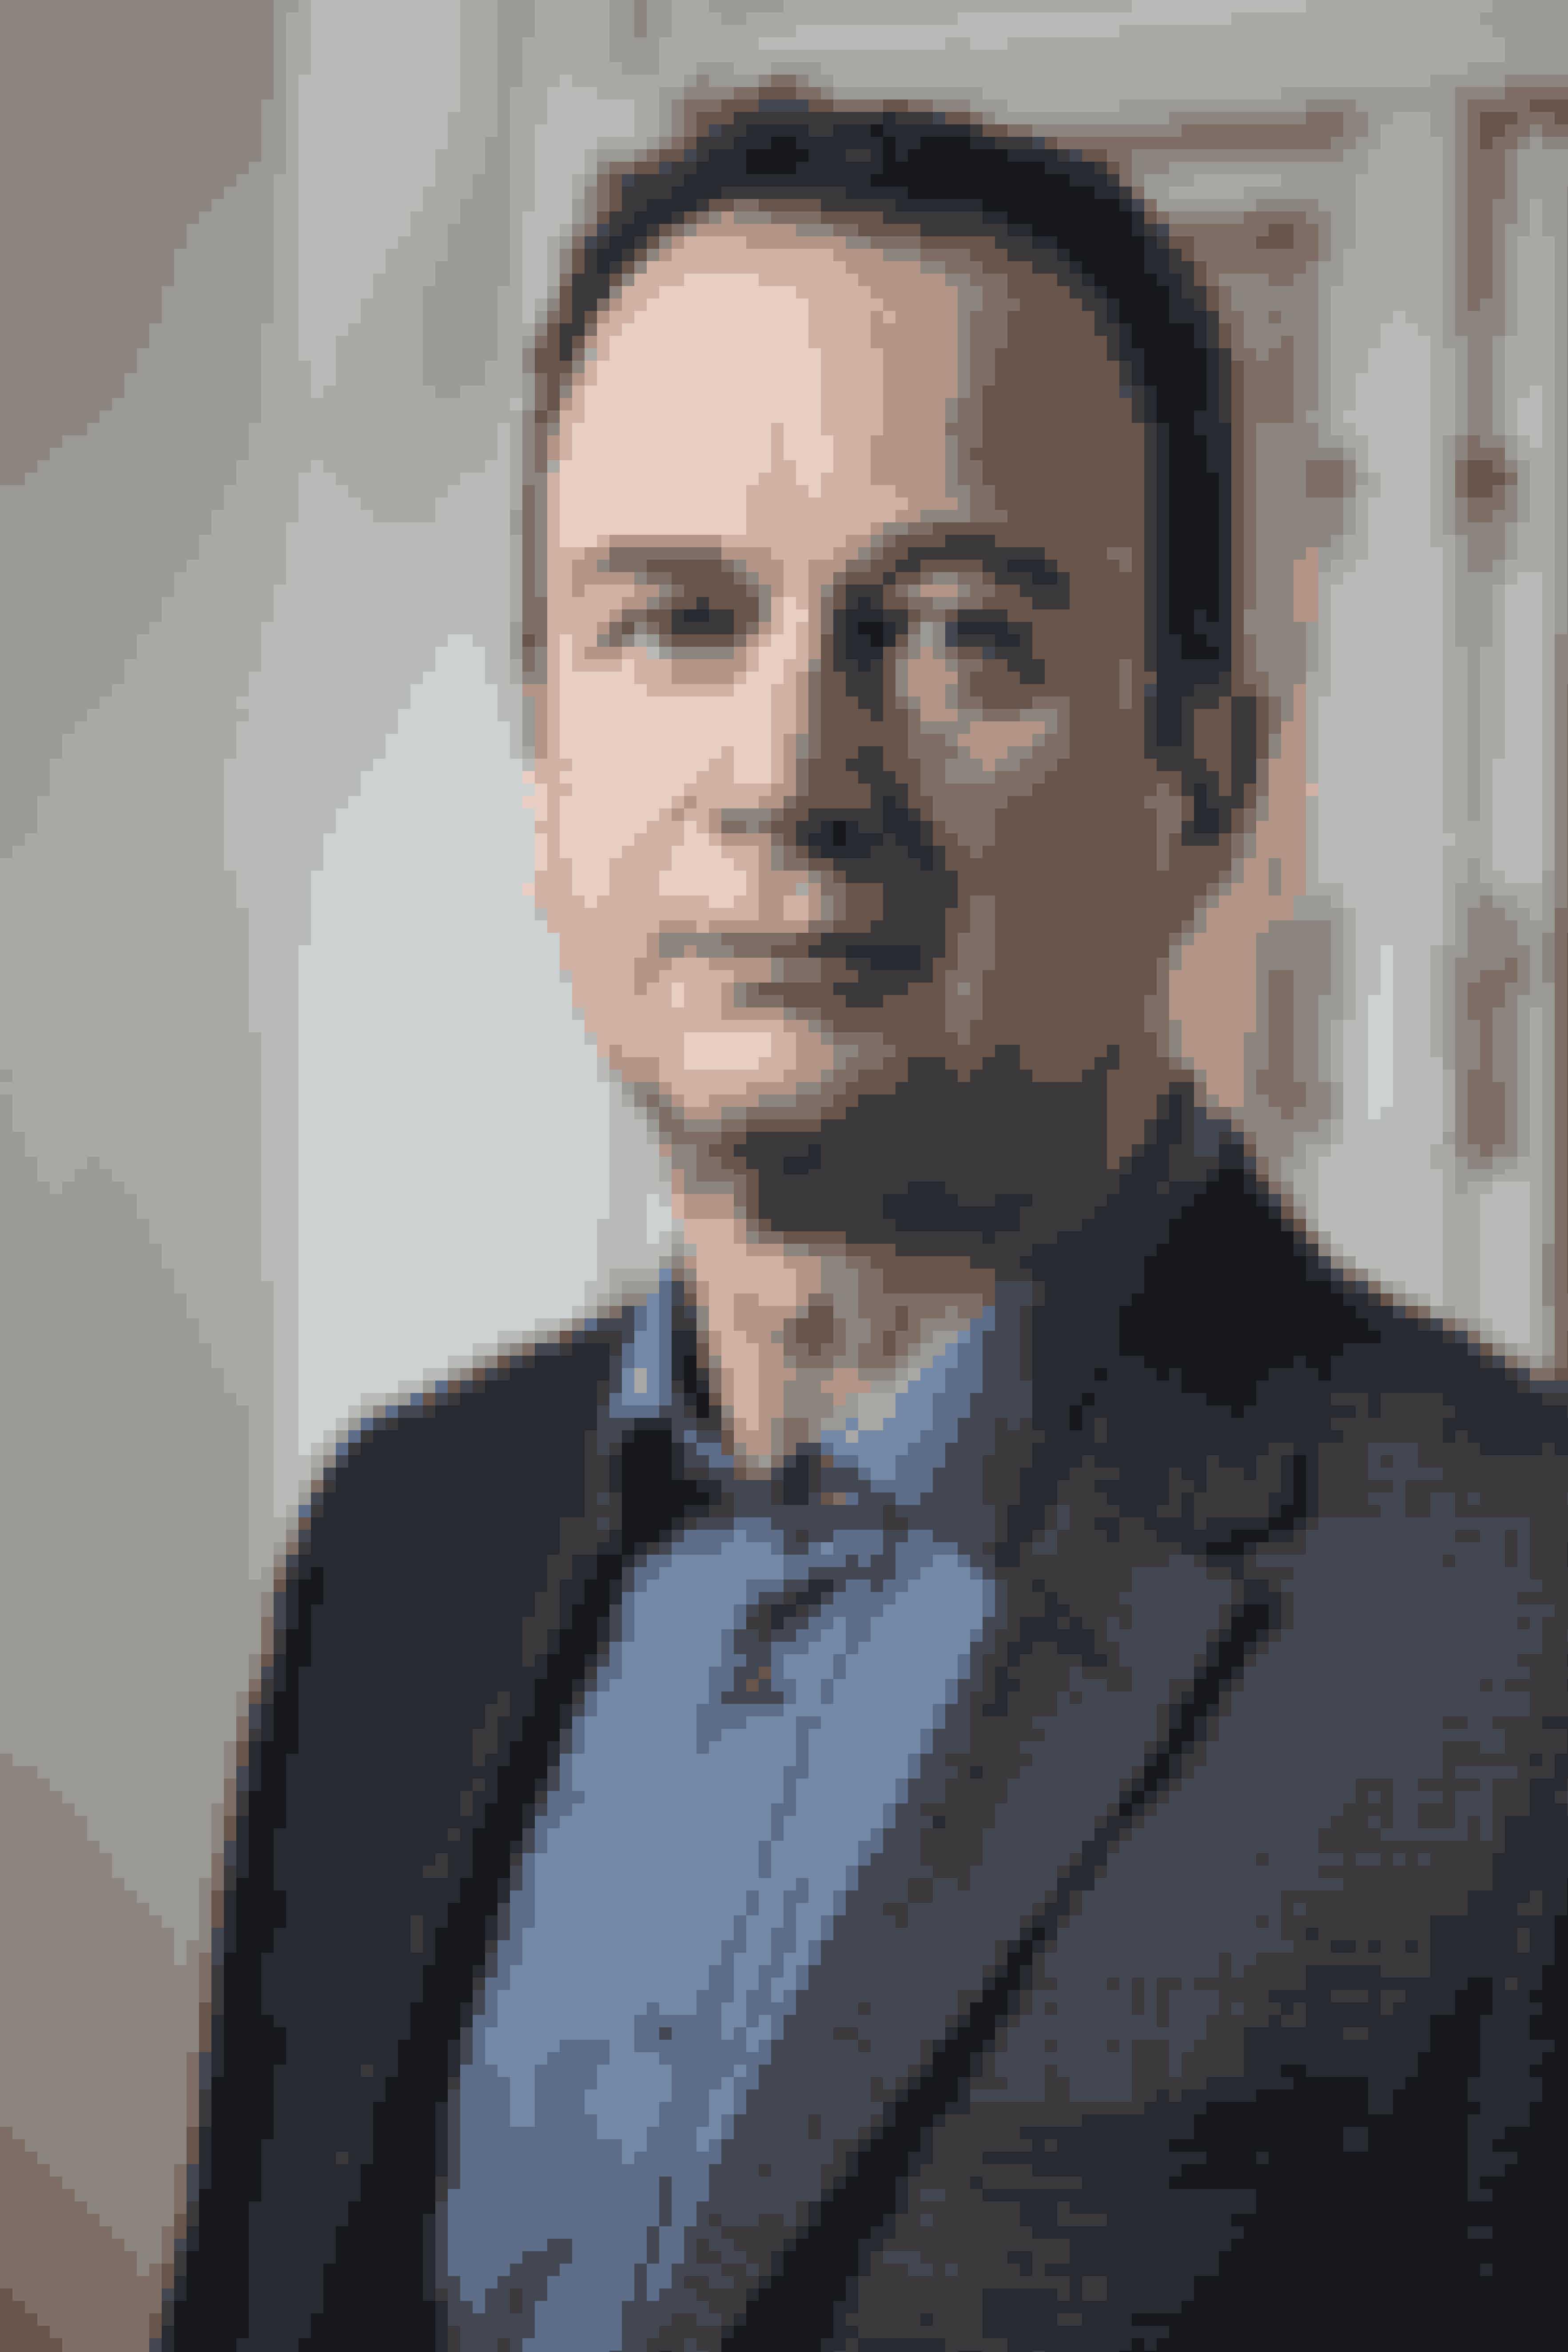 Til daglig er Jakob Stoustrup professor i reguleringsteori på Institut for Elektroniske Systemer ved Aalborg Universitet. Det er en slags raketvidenskab.